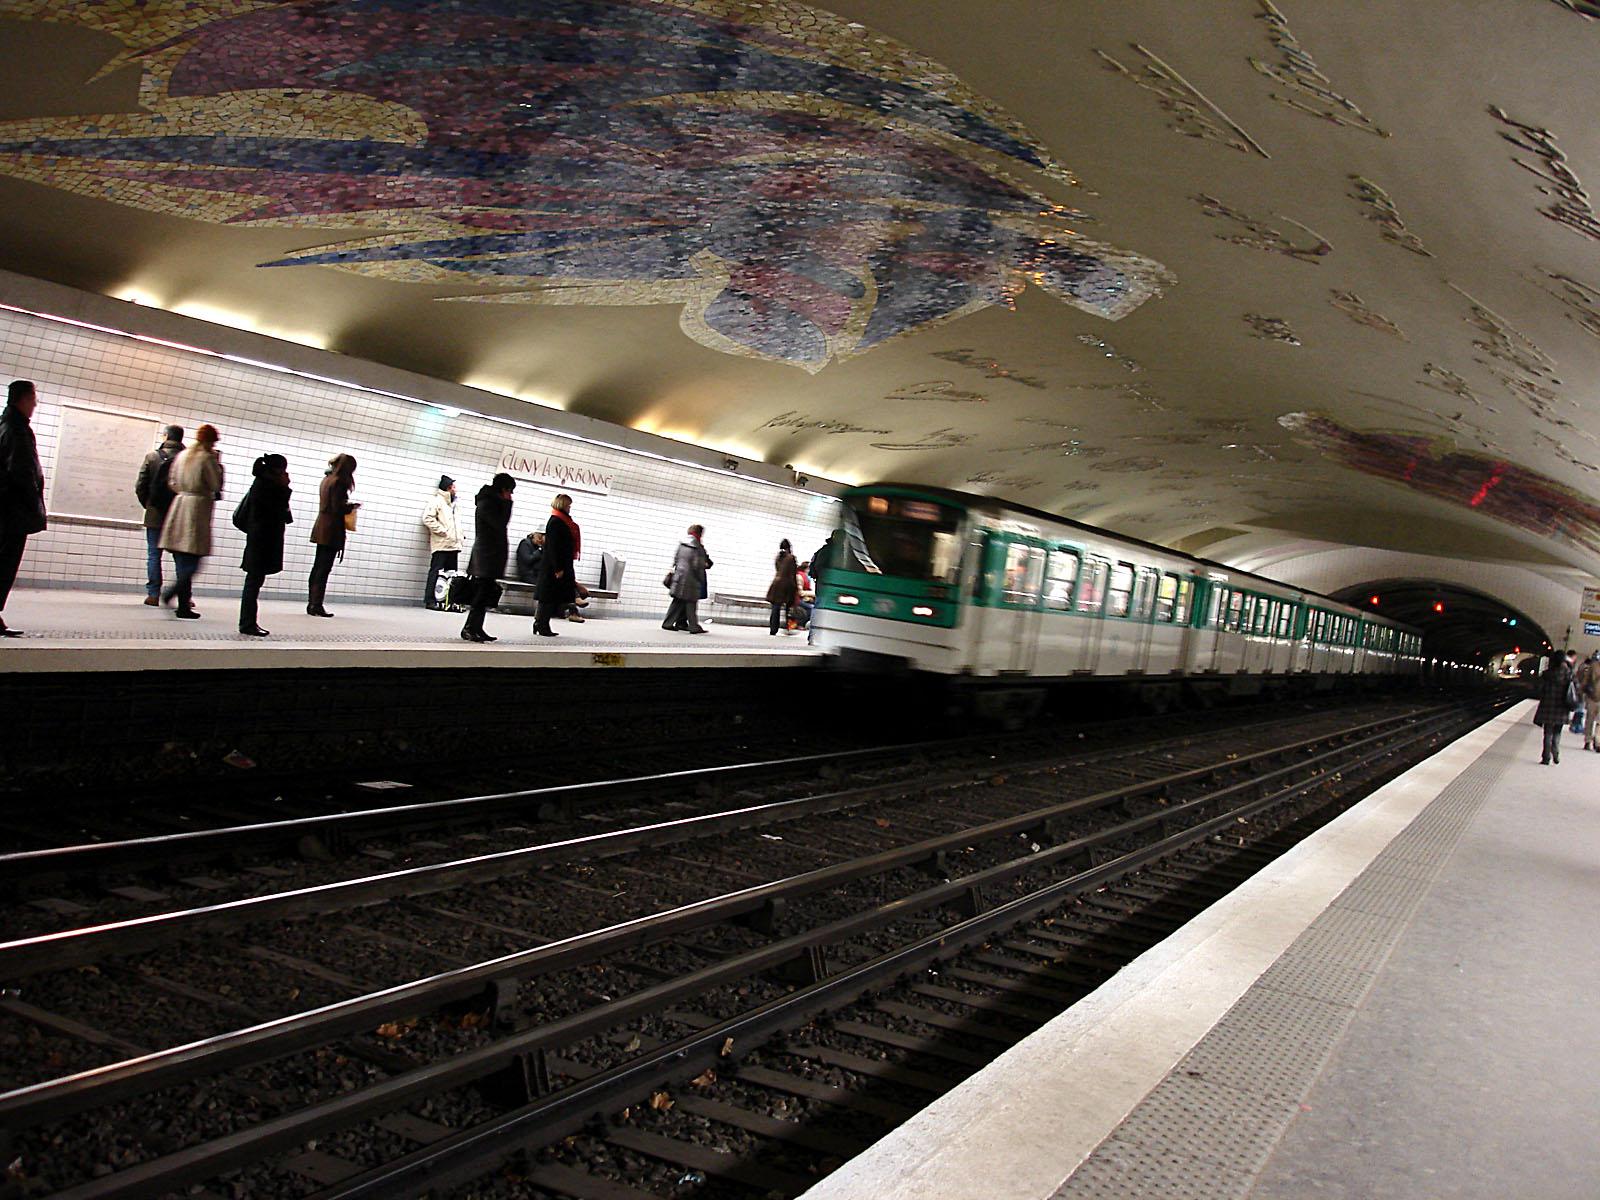 Cluny la sorbonne paris m tro wikipedia - Station metro jardin du luxembourg ...